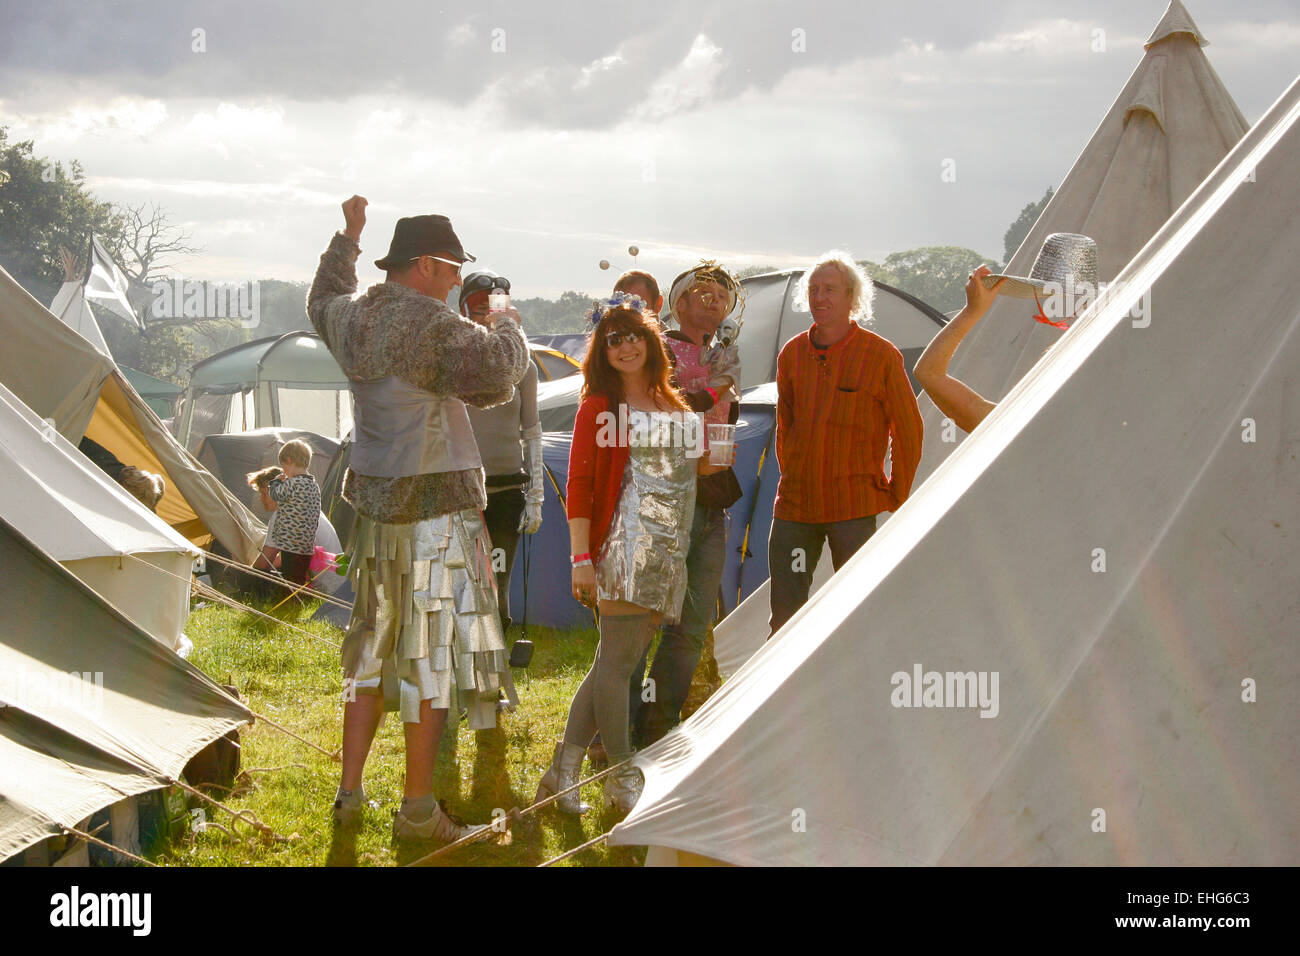 Joli camping dans le cadre d'un festival en Angleterre. Banque D'Images